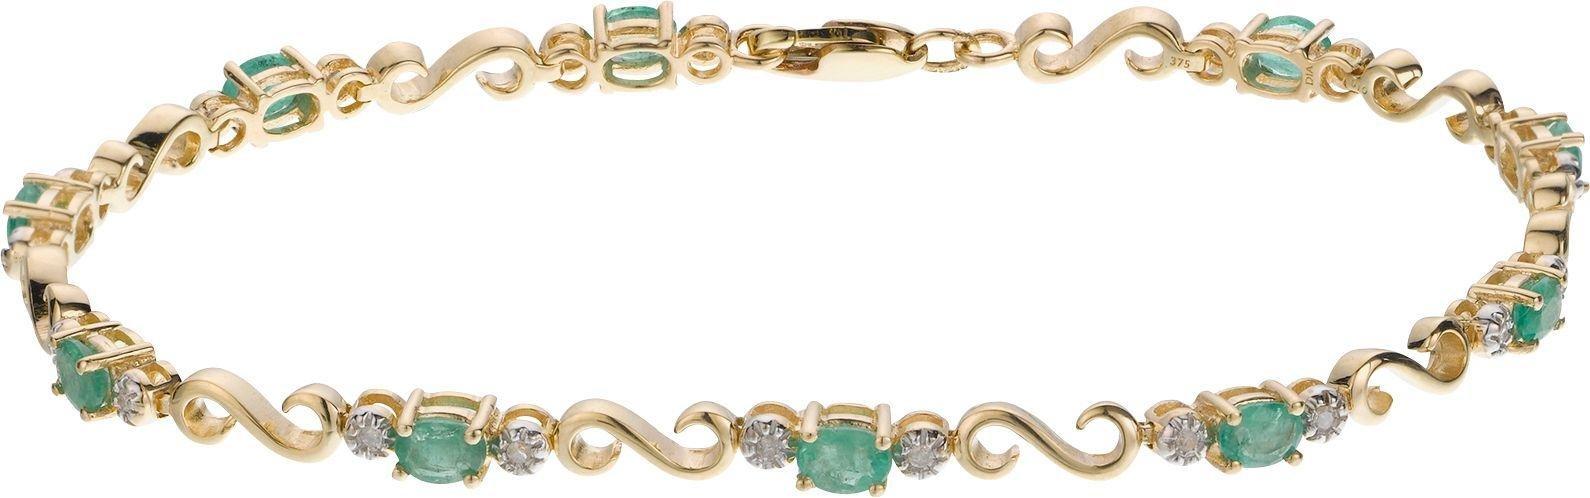 9 Carat Gold - Emerald and 0.10 Carat Diamond Bracelet.